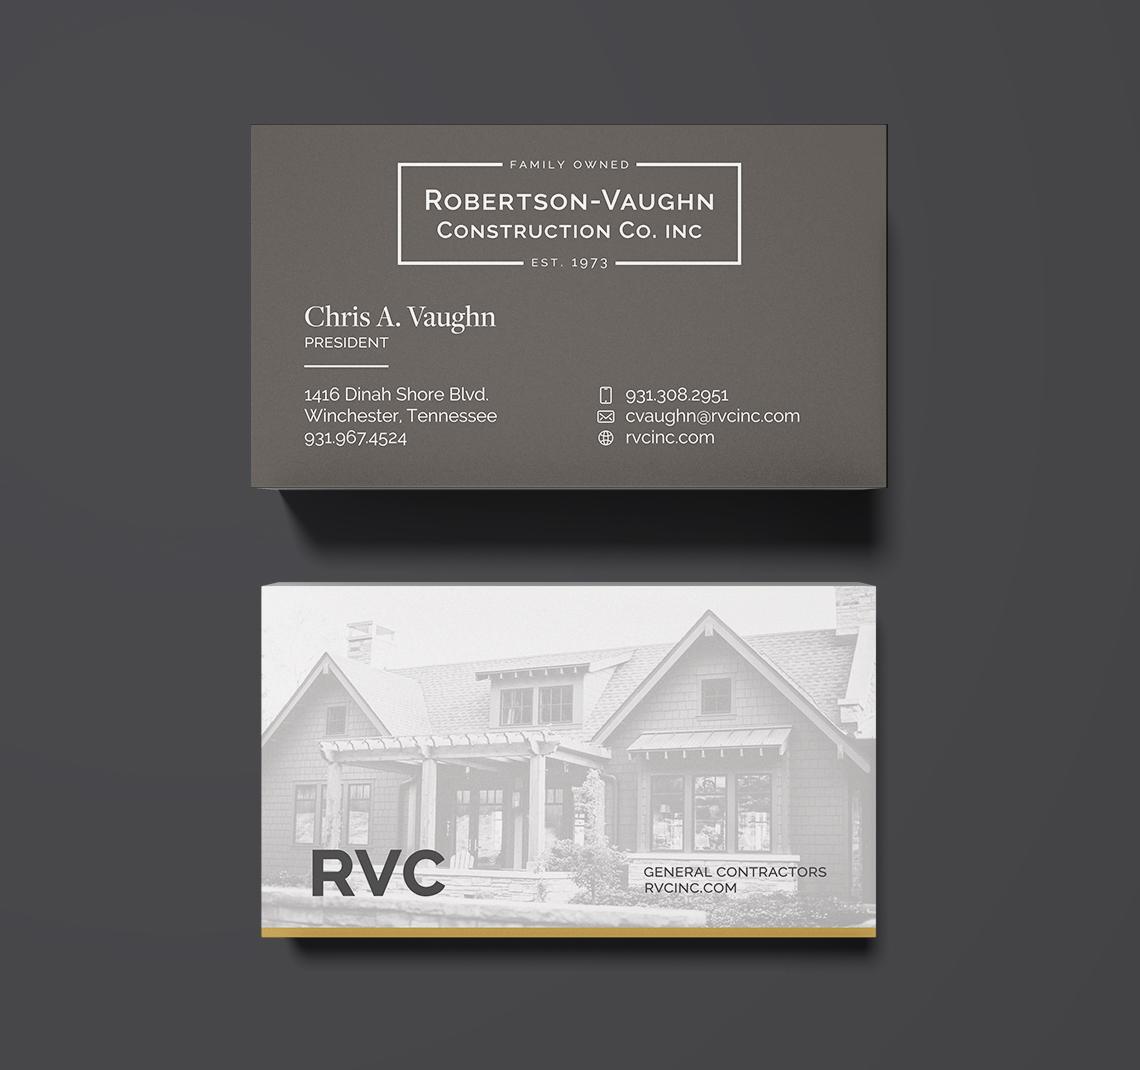 Robertson-Vaughn Construction Co. Business Card Design